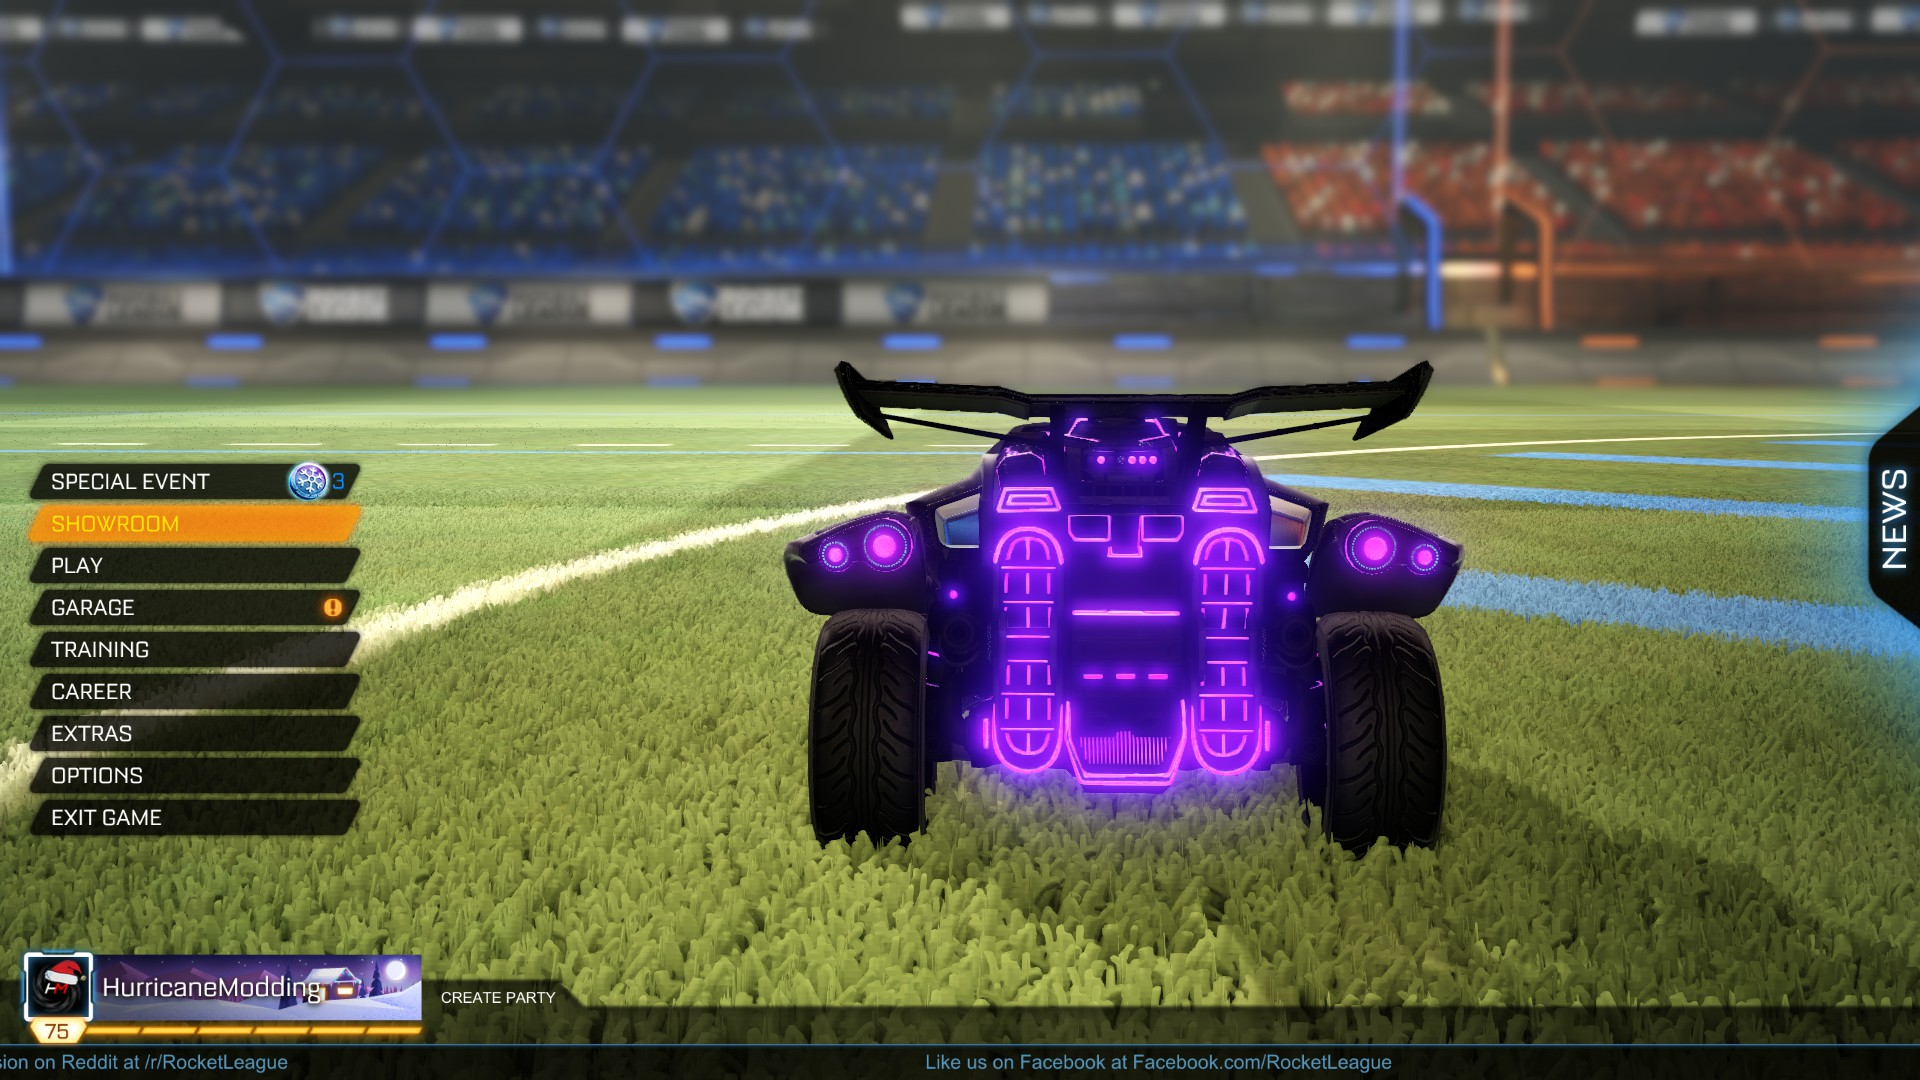 ZSR Neons, GlowEngine 2.0